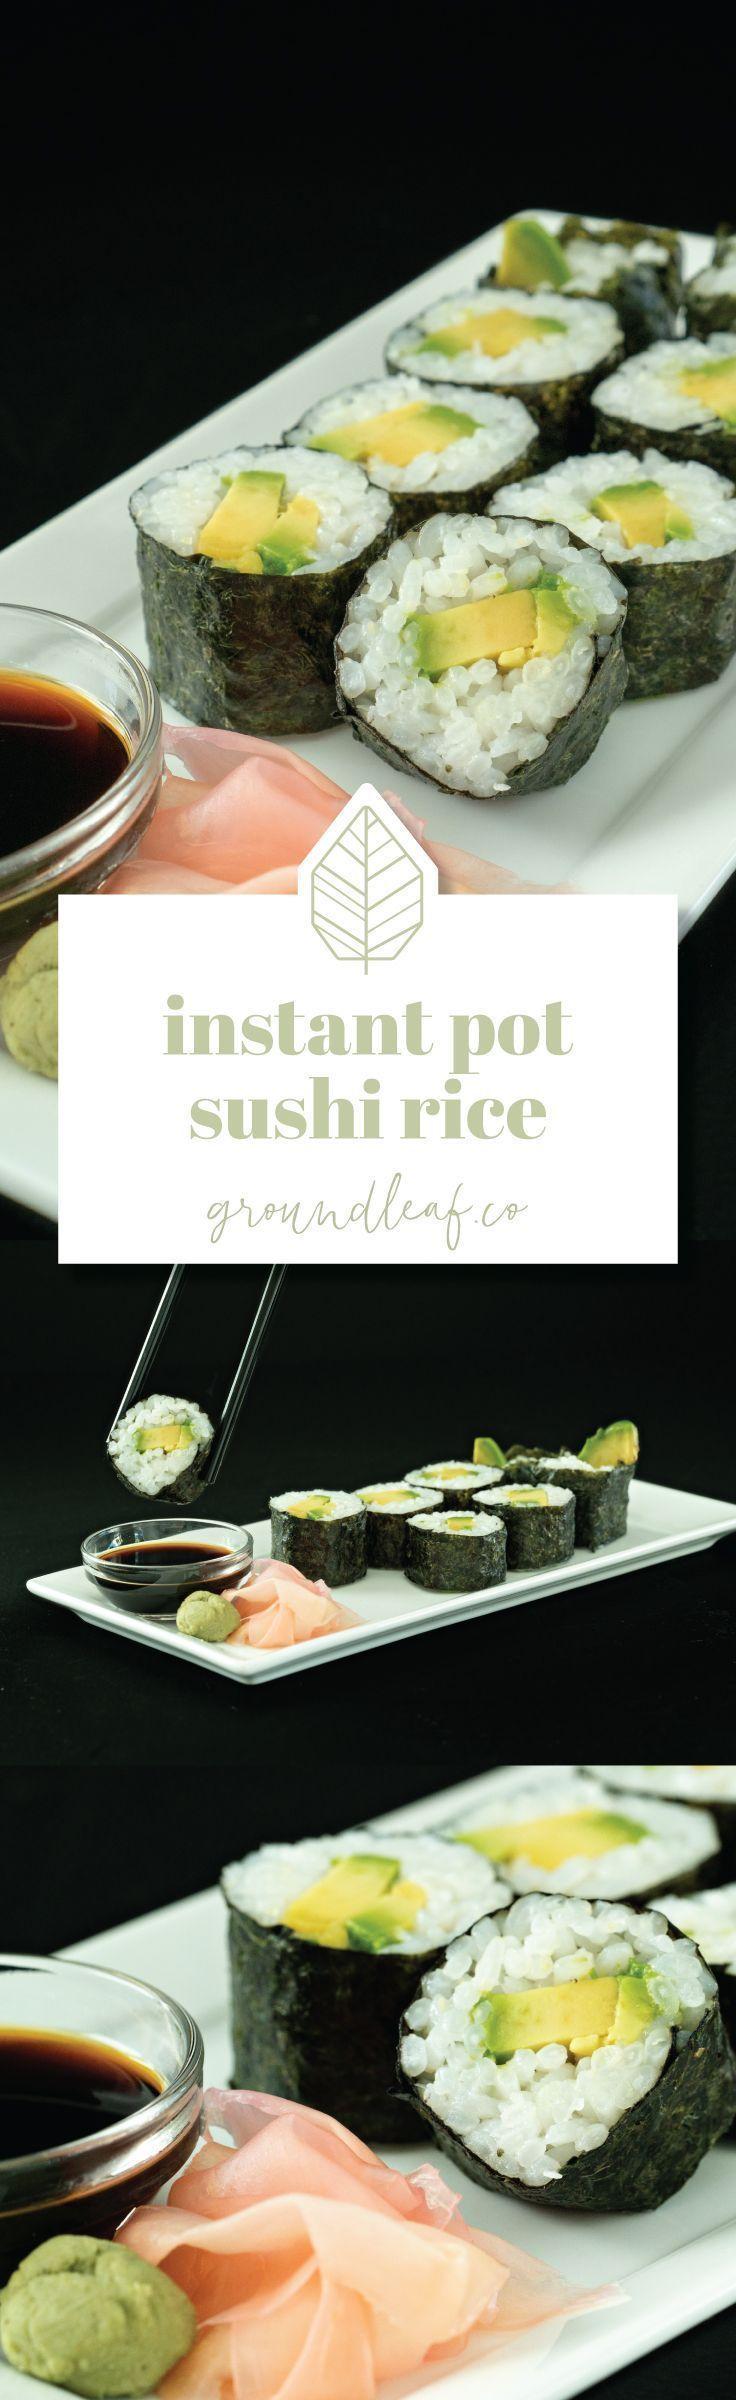 Instant Pot Sushi Rice Vegan Sushi rice, Instant pot